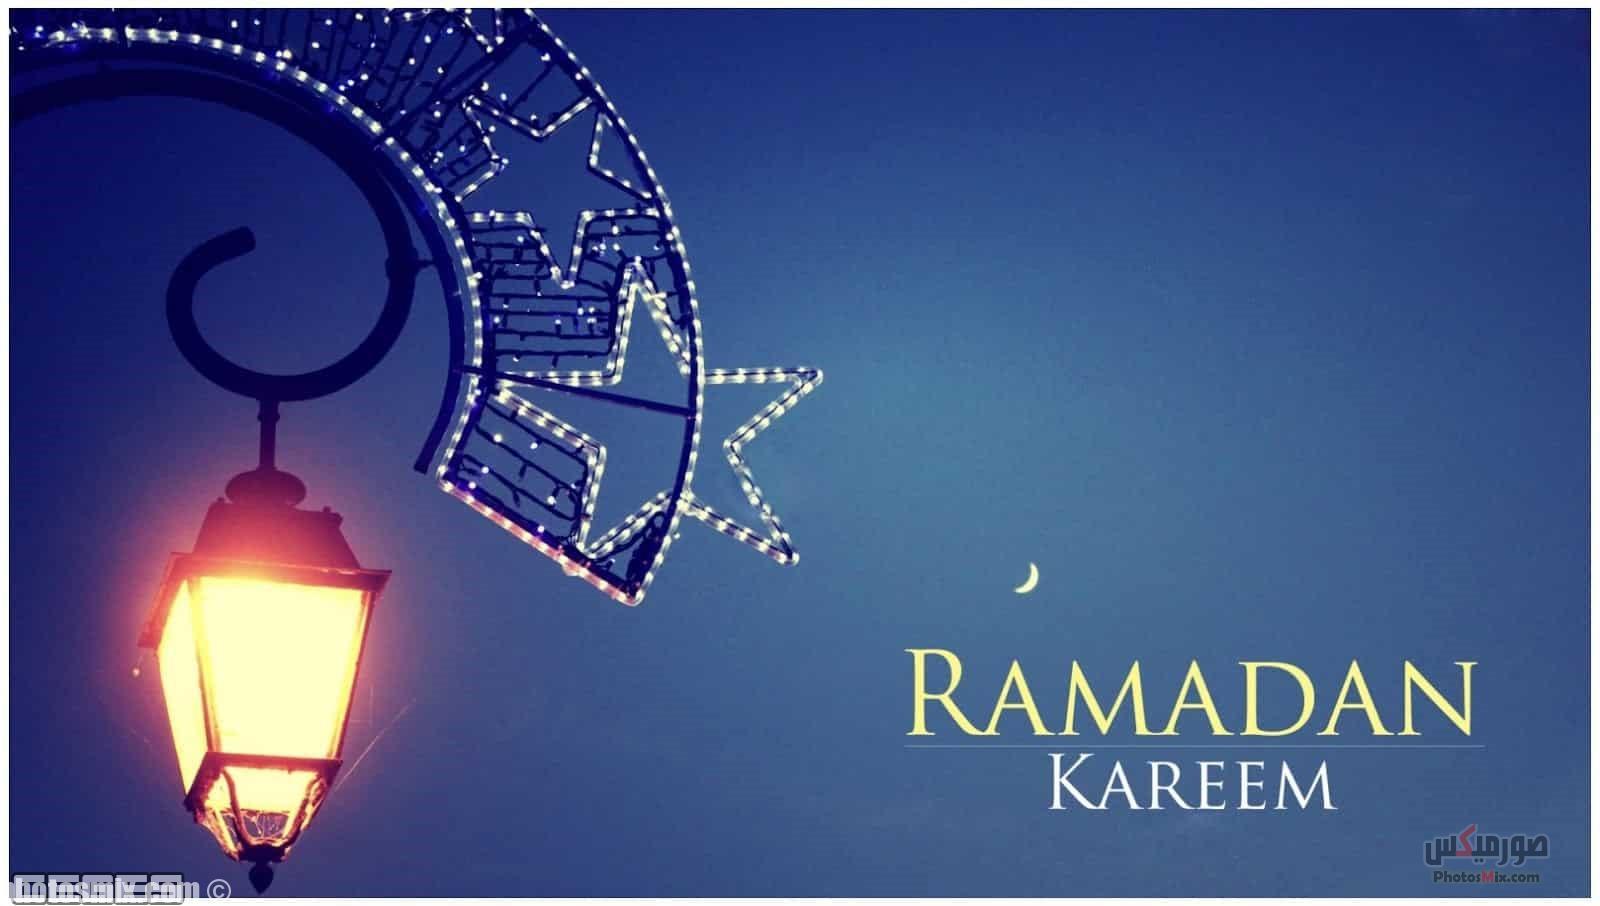 ص صور رمضان 2019 أجمل صور تهنئة رمضان 2020 بطاقات تهنئة لرمضان تهنئة رمضان بالأسماء صورميكس 6 2